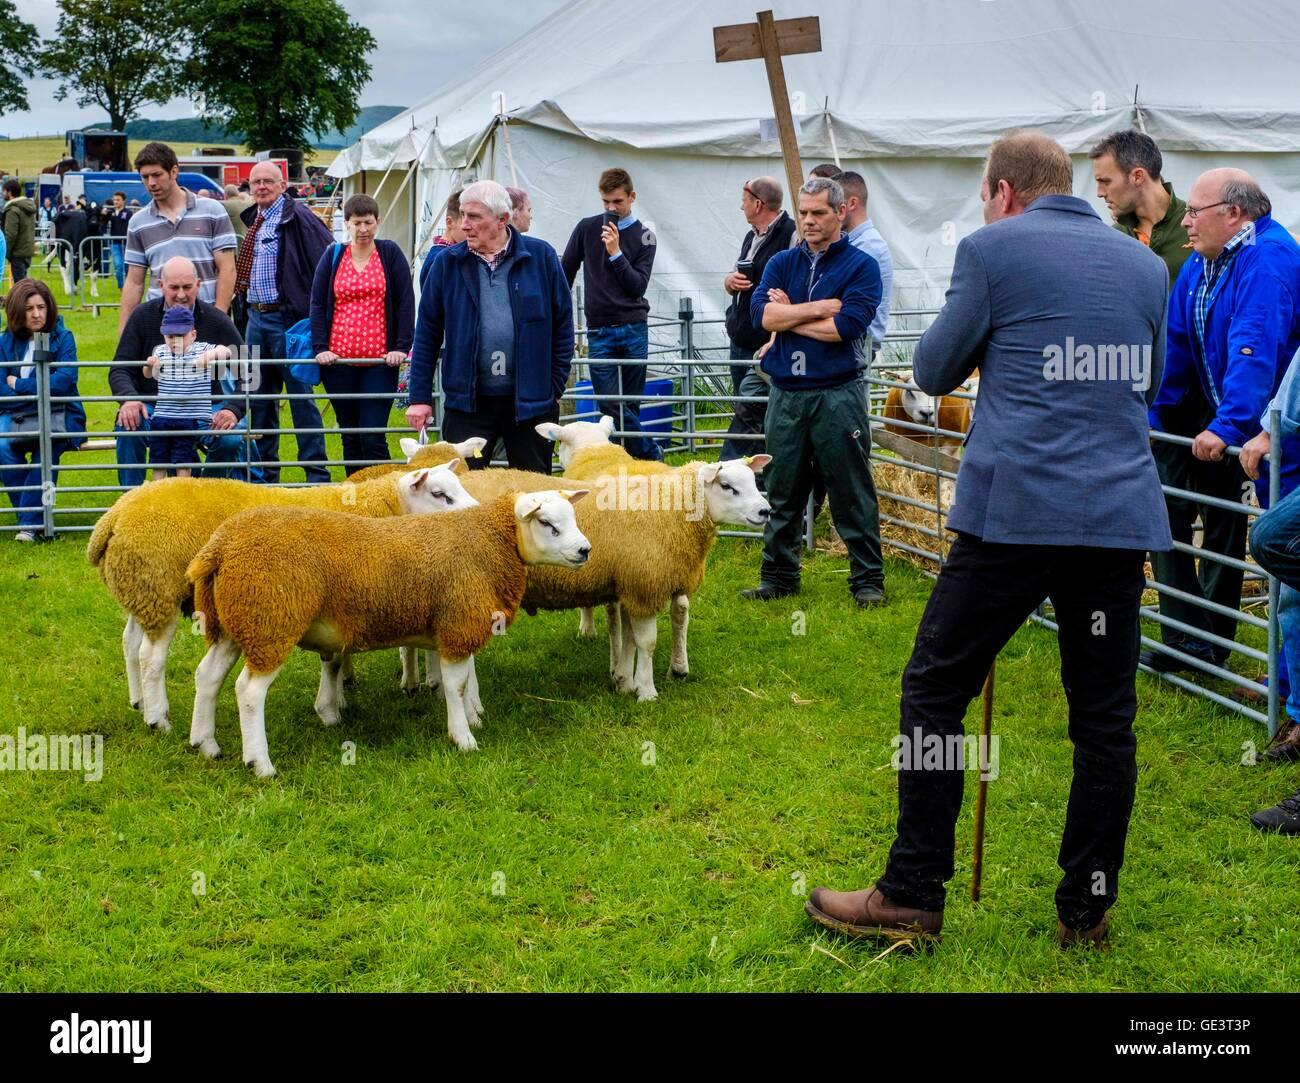 Biggar Agricultural Show - Biggar, South Lanarkshire - 23rd